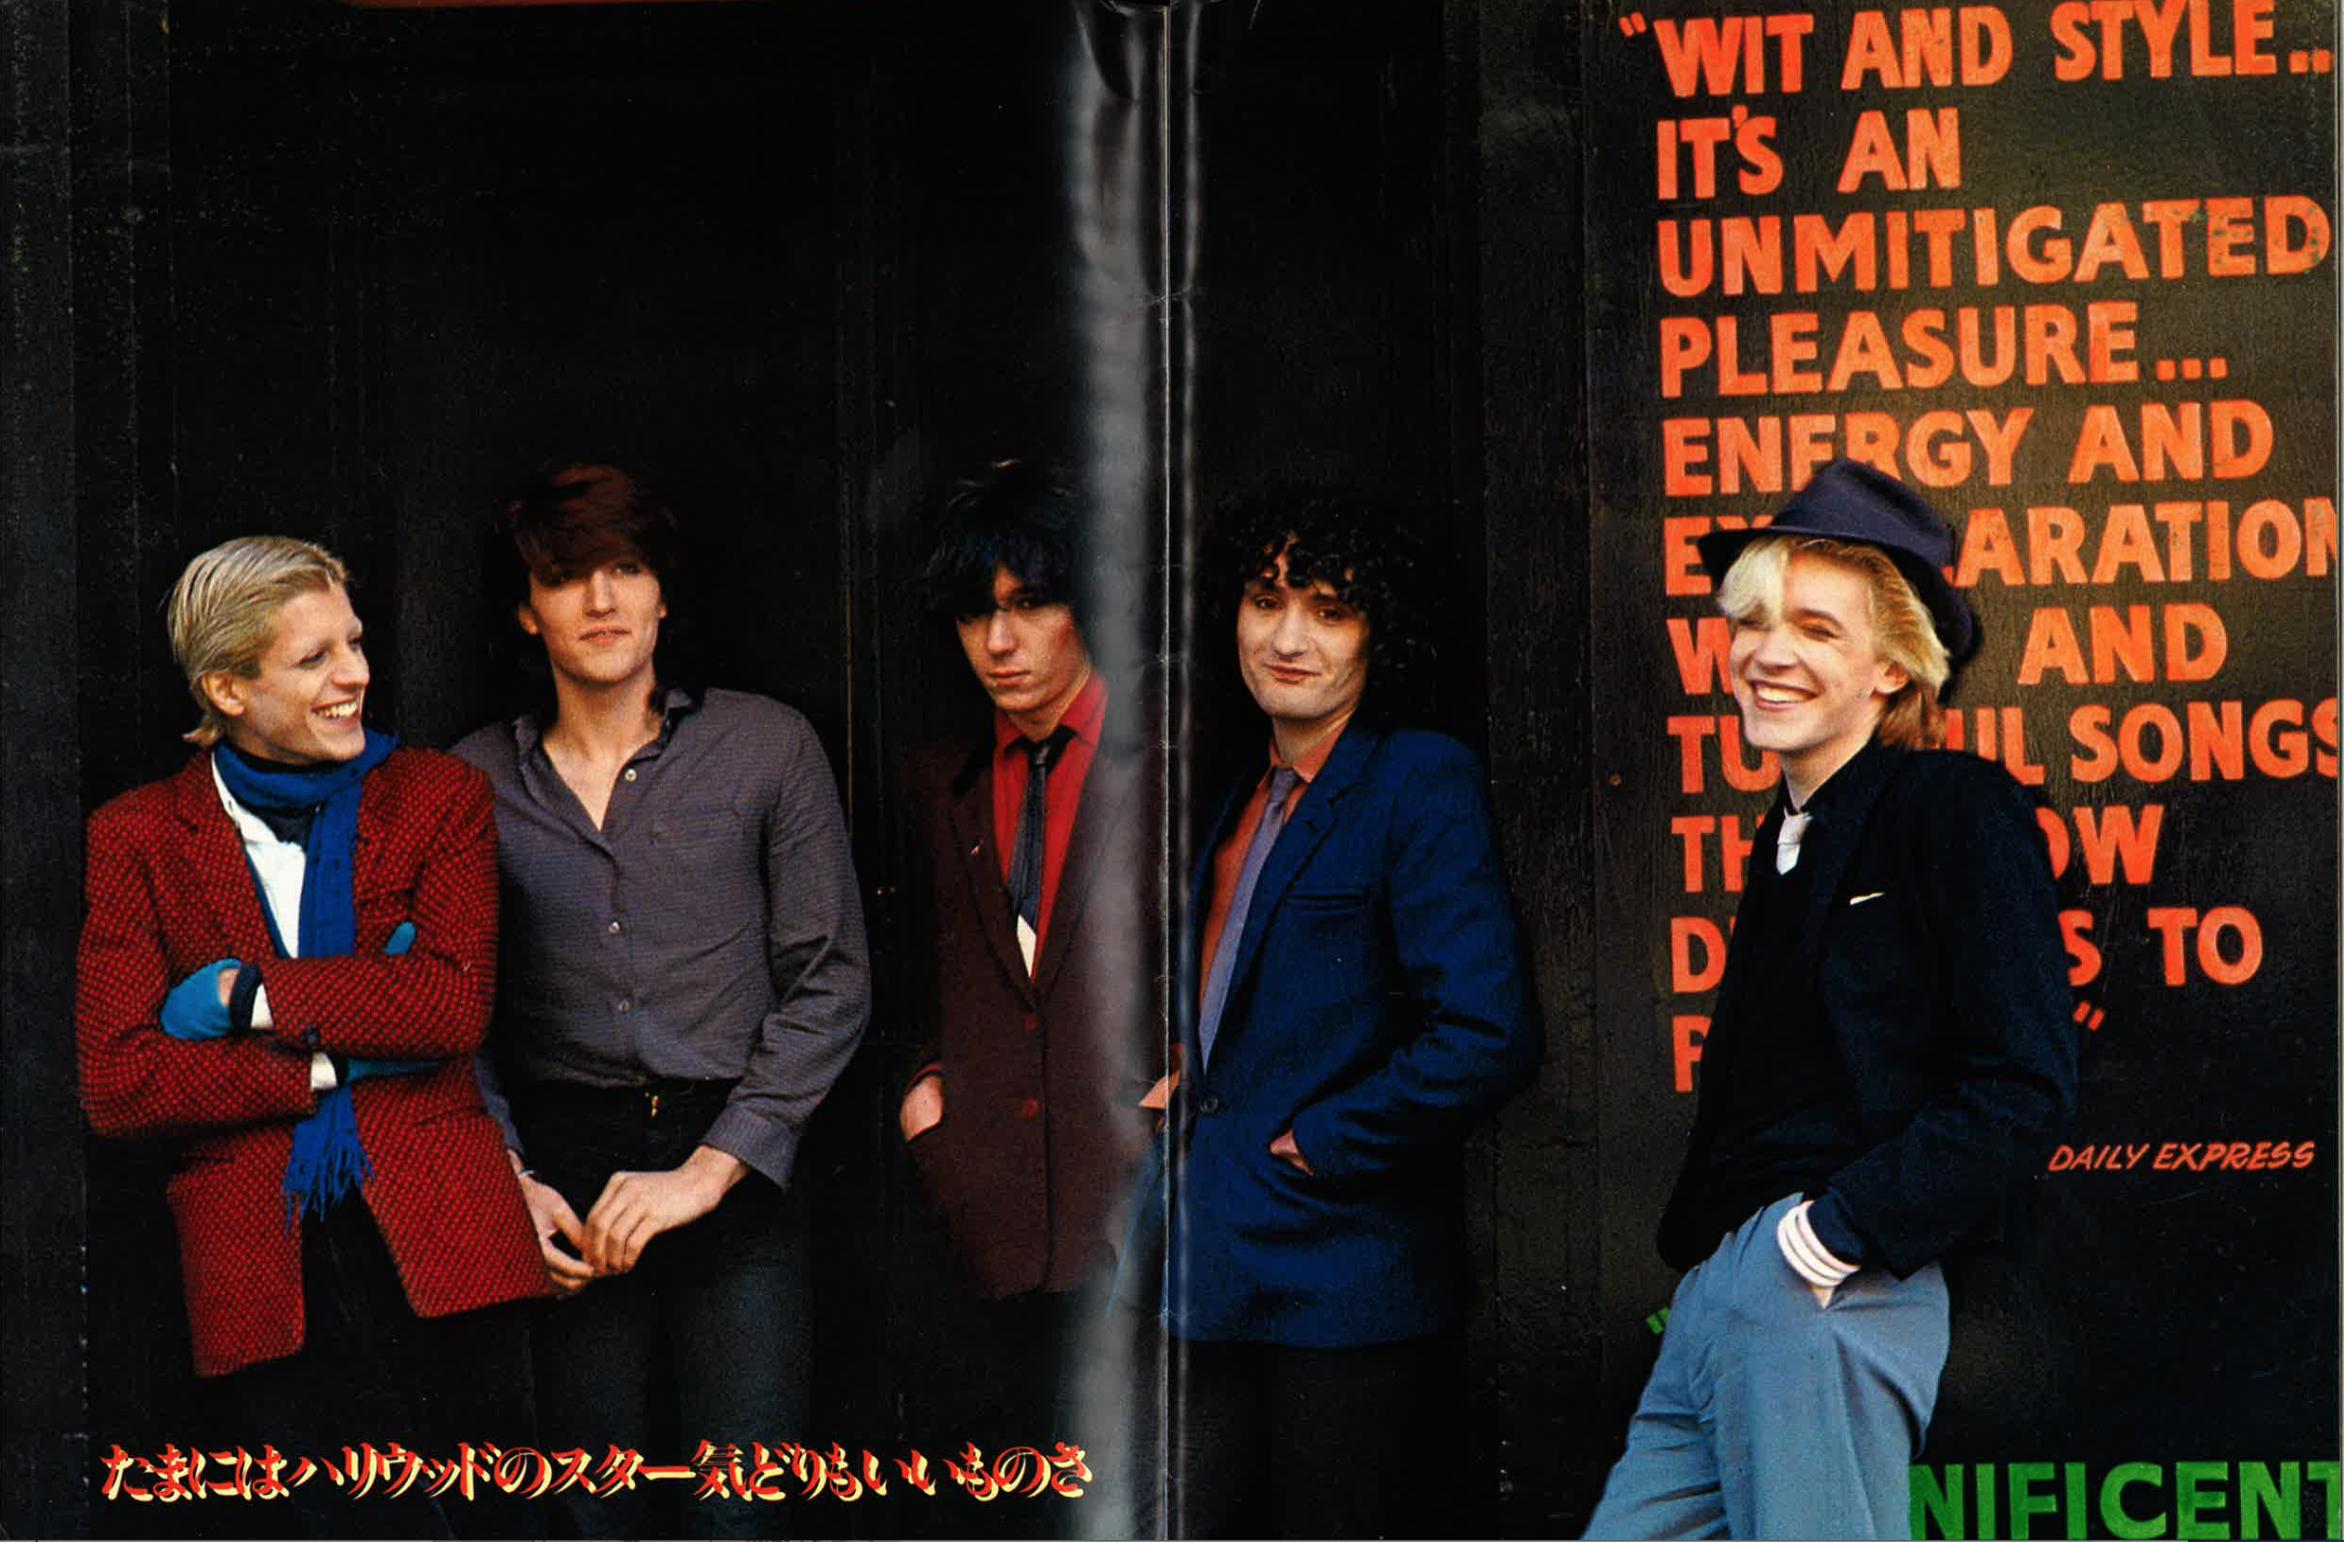 Japan | band | Mick Karn | Steve Jansen | Richard Barbieri | Rob Dean | David Sylvian | Covent Garden | London | 1980 | Unknown photographer